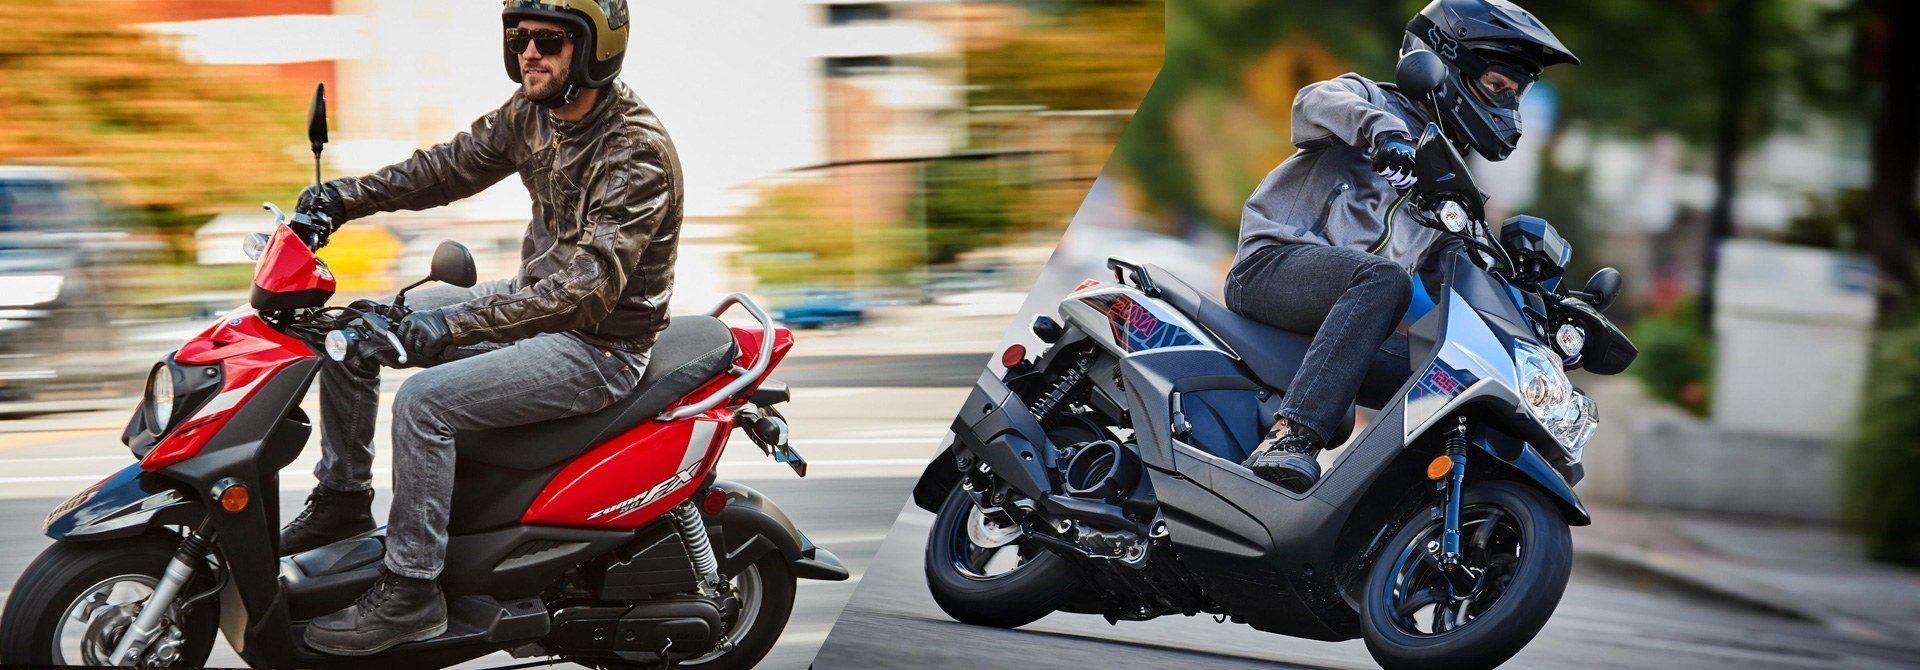 Motorcycle dealer new york honda yamaha scooter parts for Honda dealership nyc